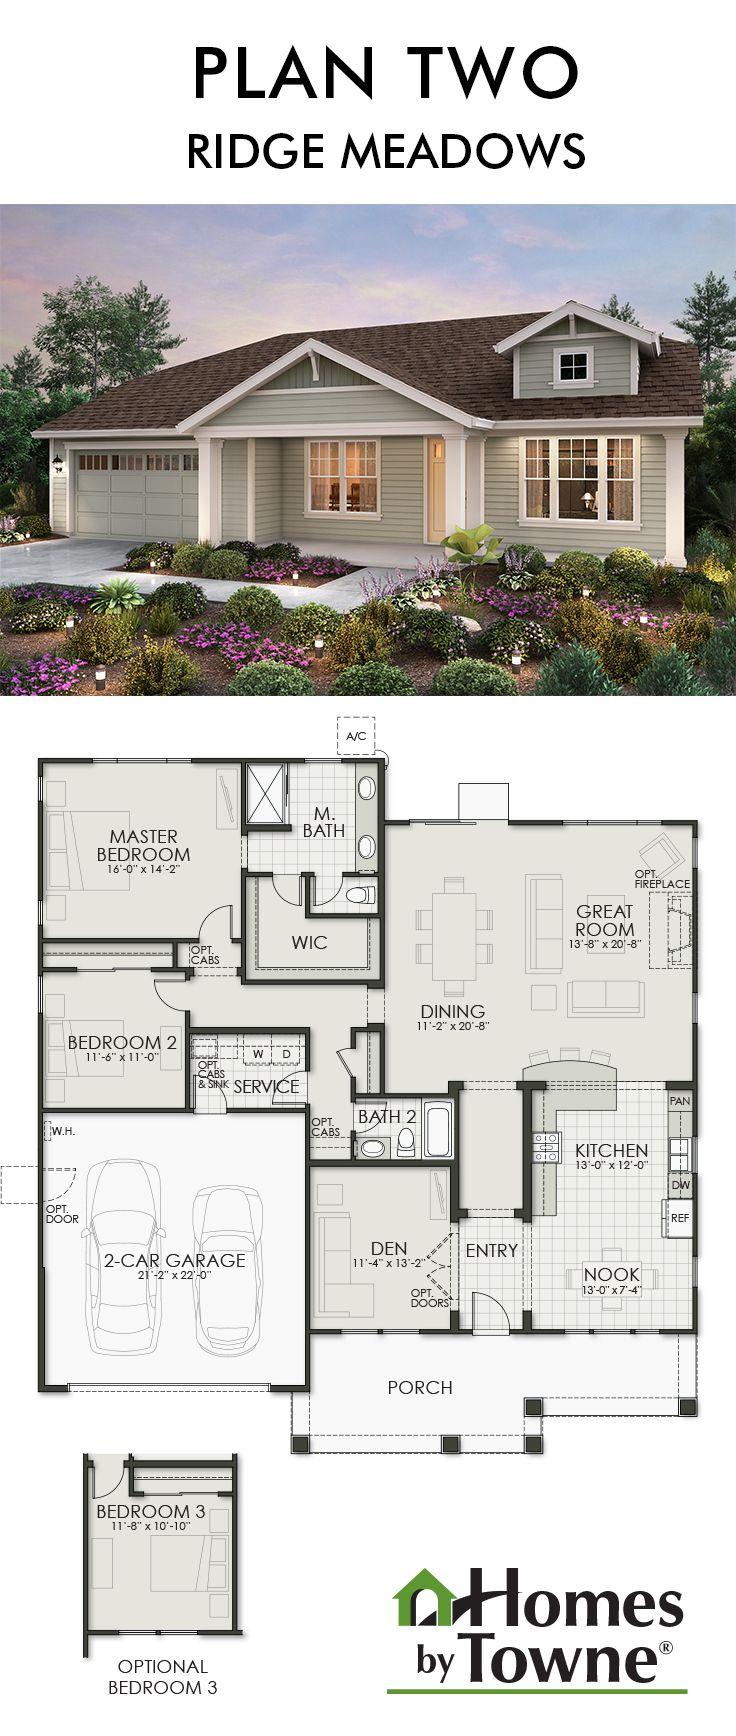 plan two ridge meadows grass valley california homes by towne - California Home Floor Plans